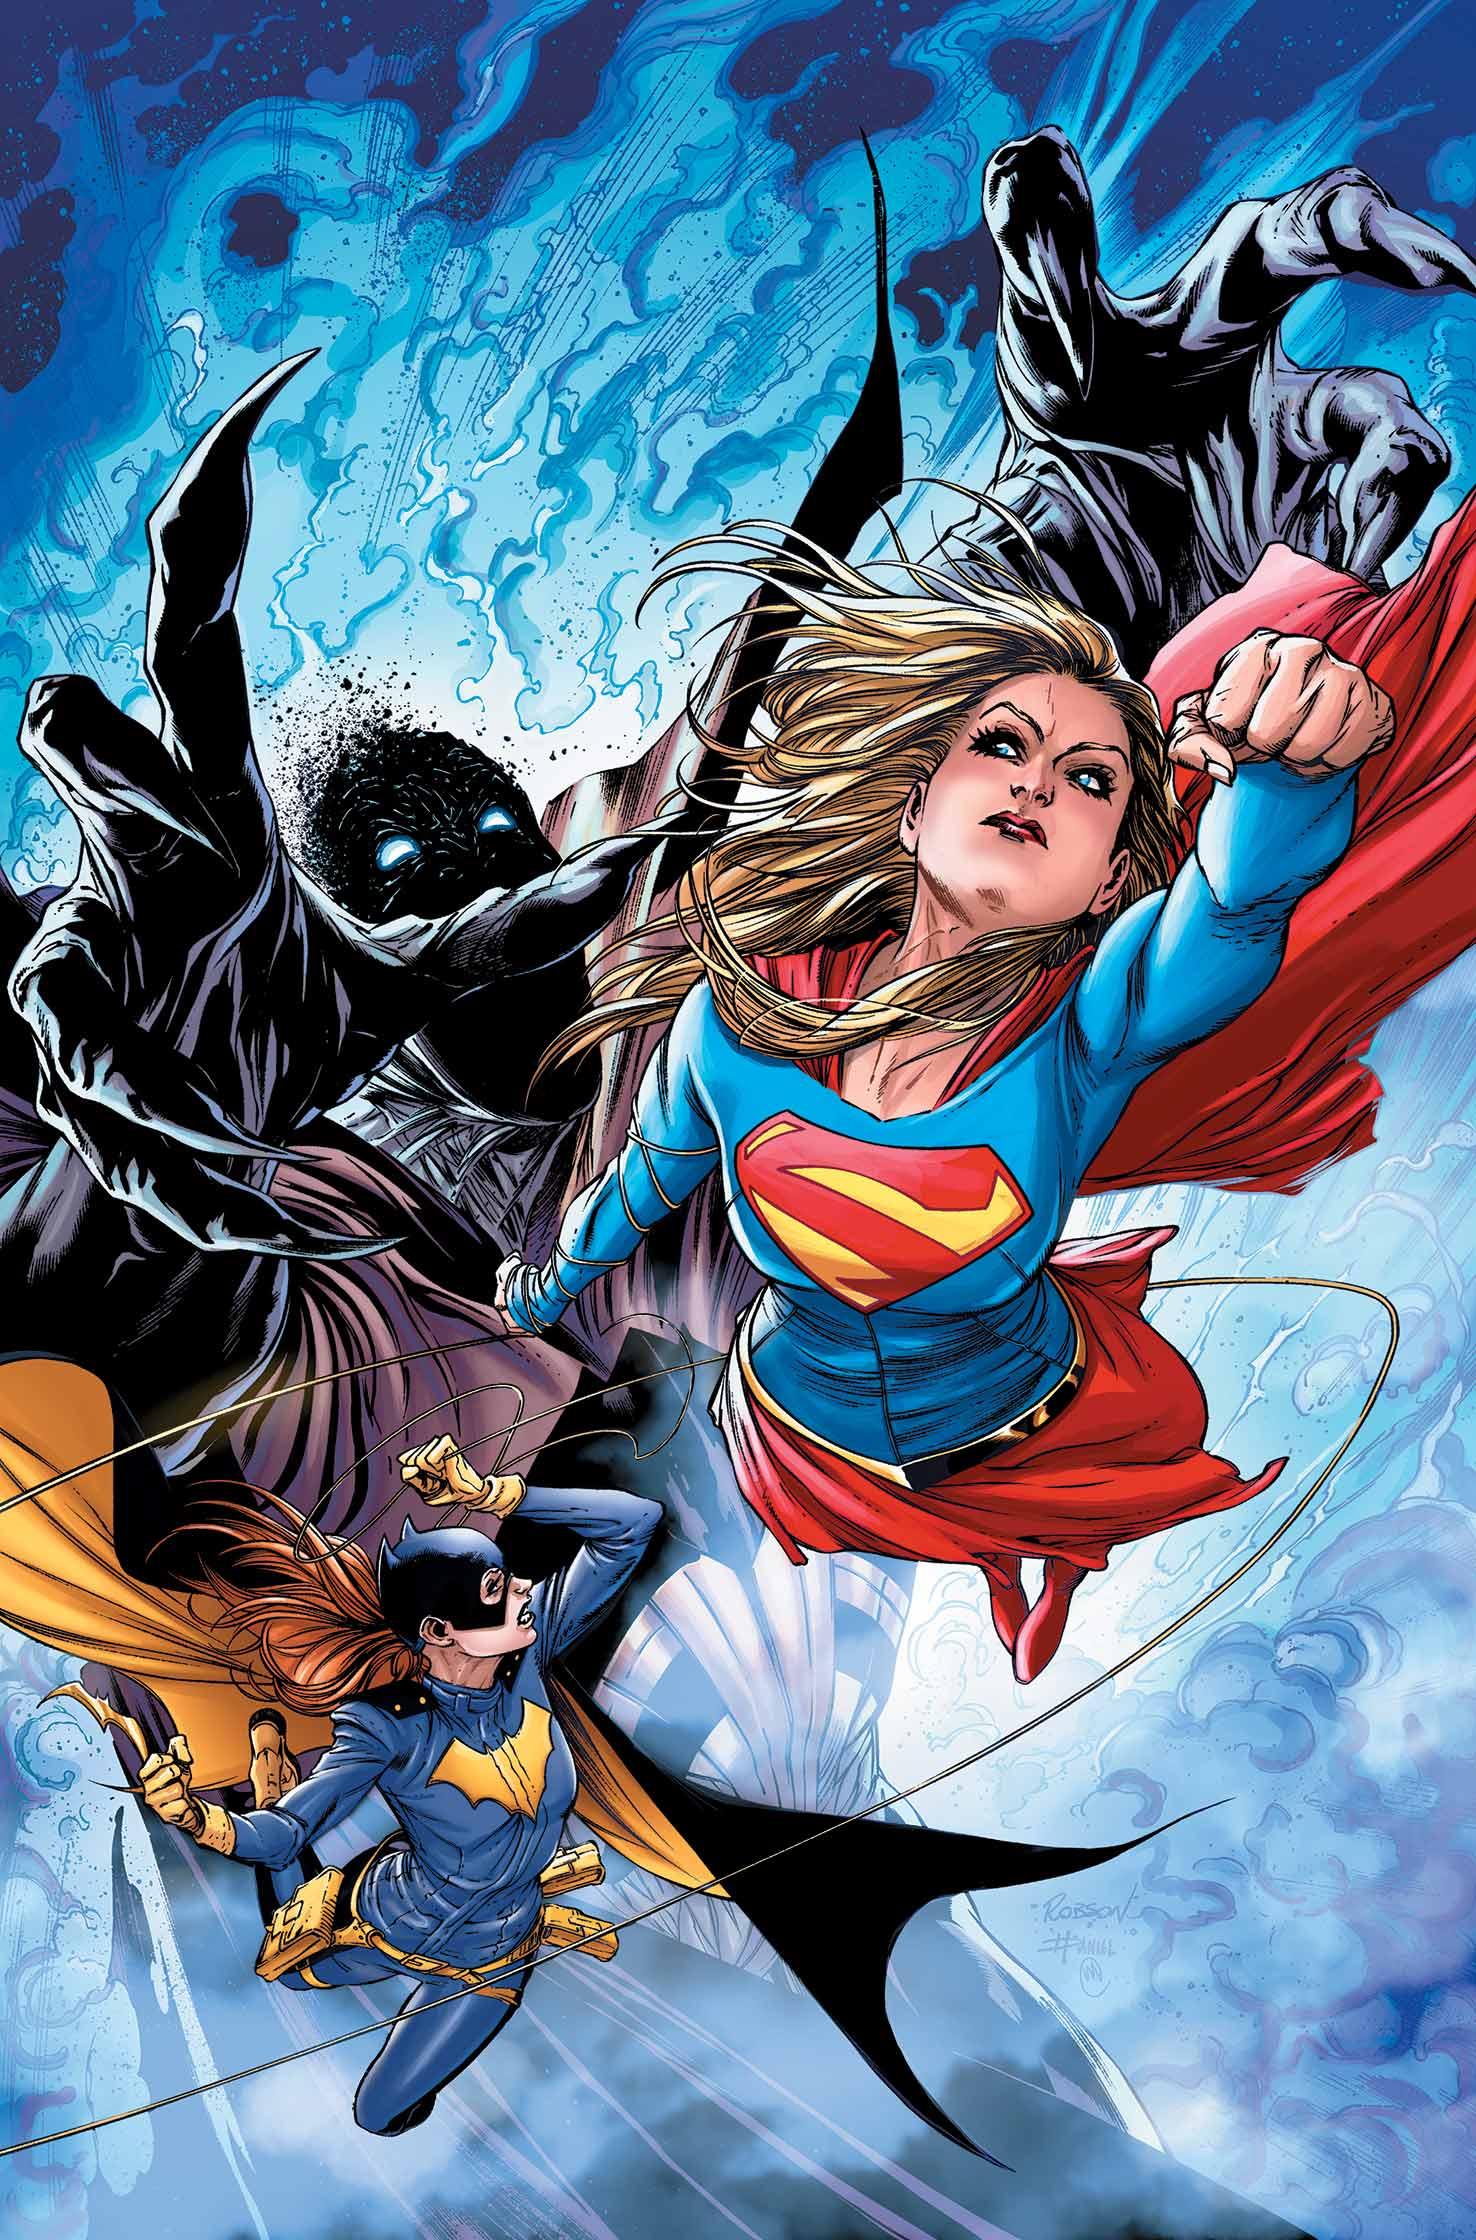 Supergirl Vol 7 10 Textless.jpg